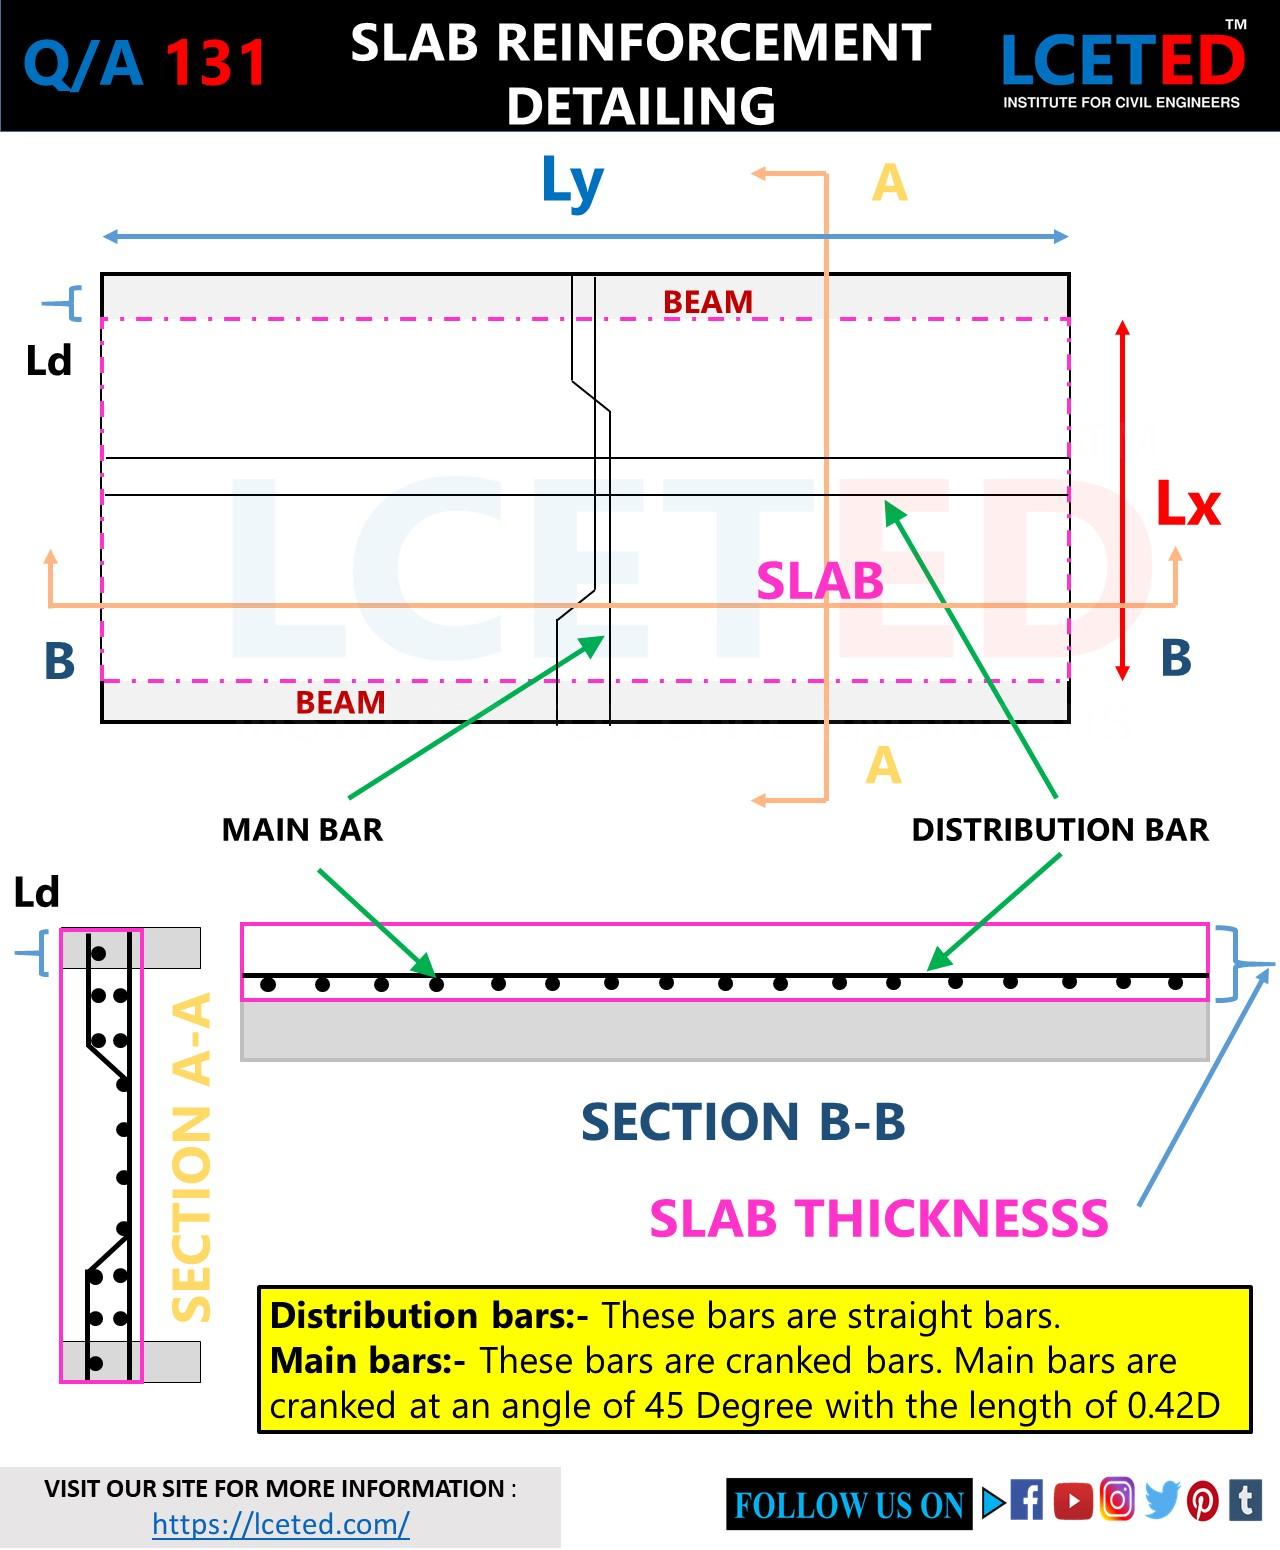 SLAB-BAR BENDING SCHEDULE